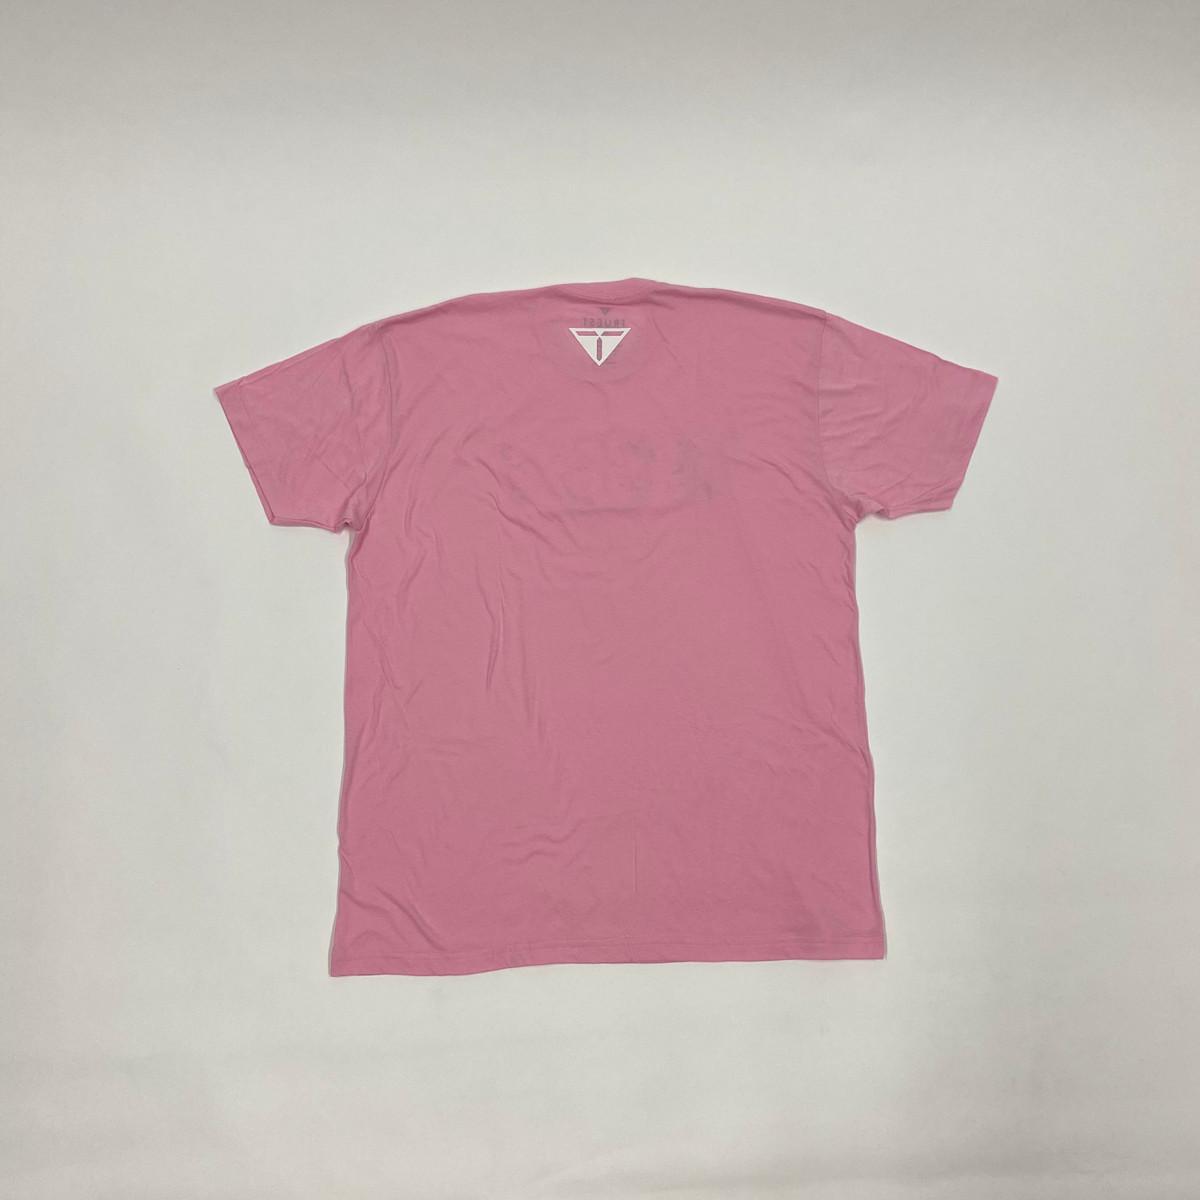 Truest Hibiscus T-shirt Pink